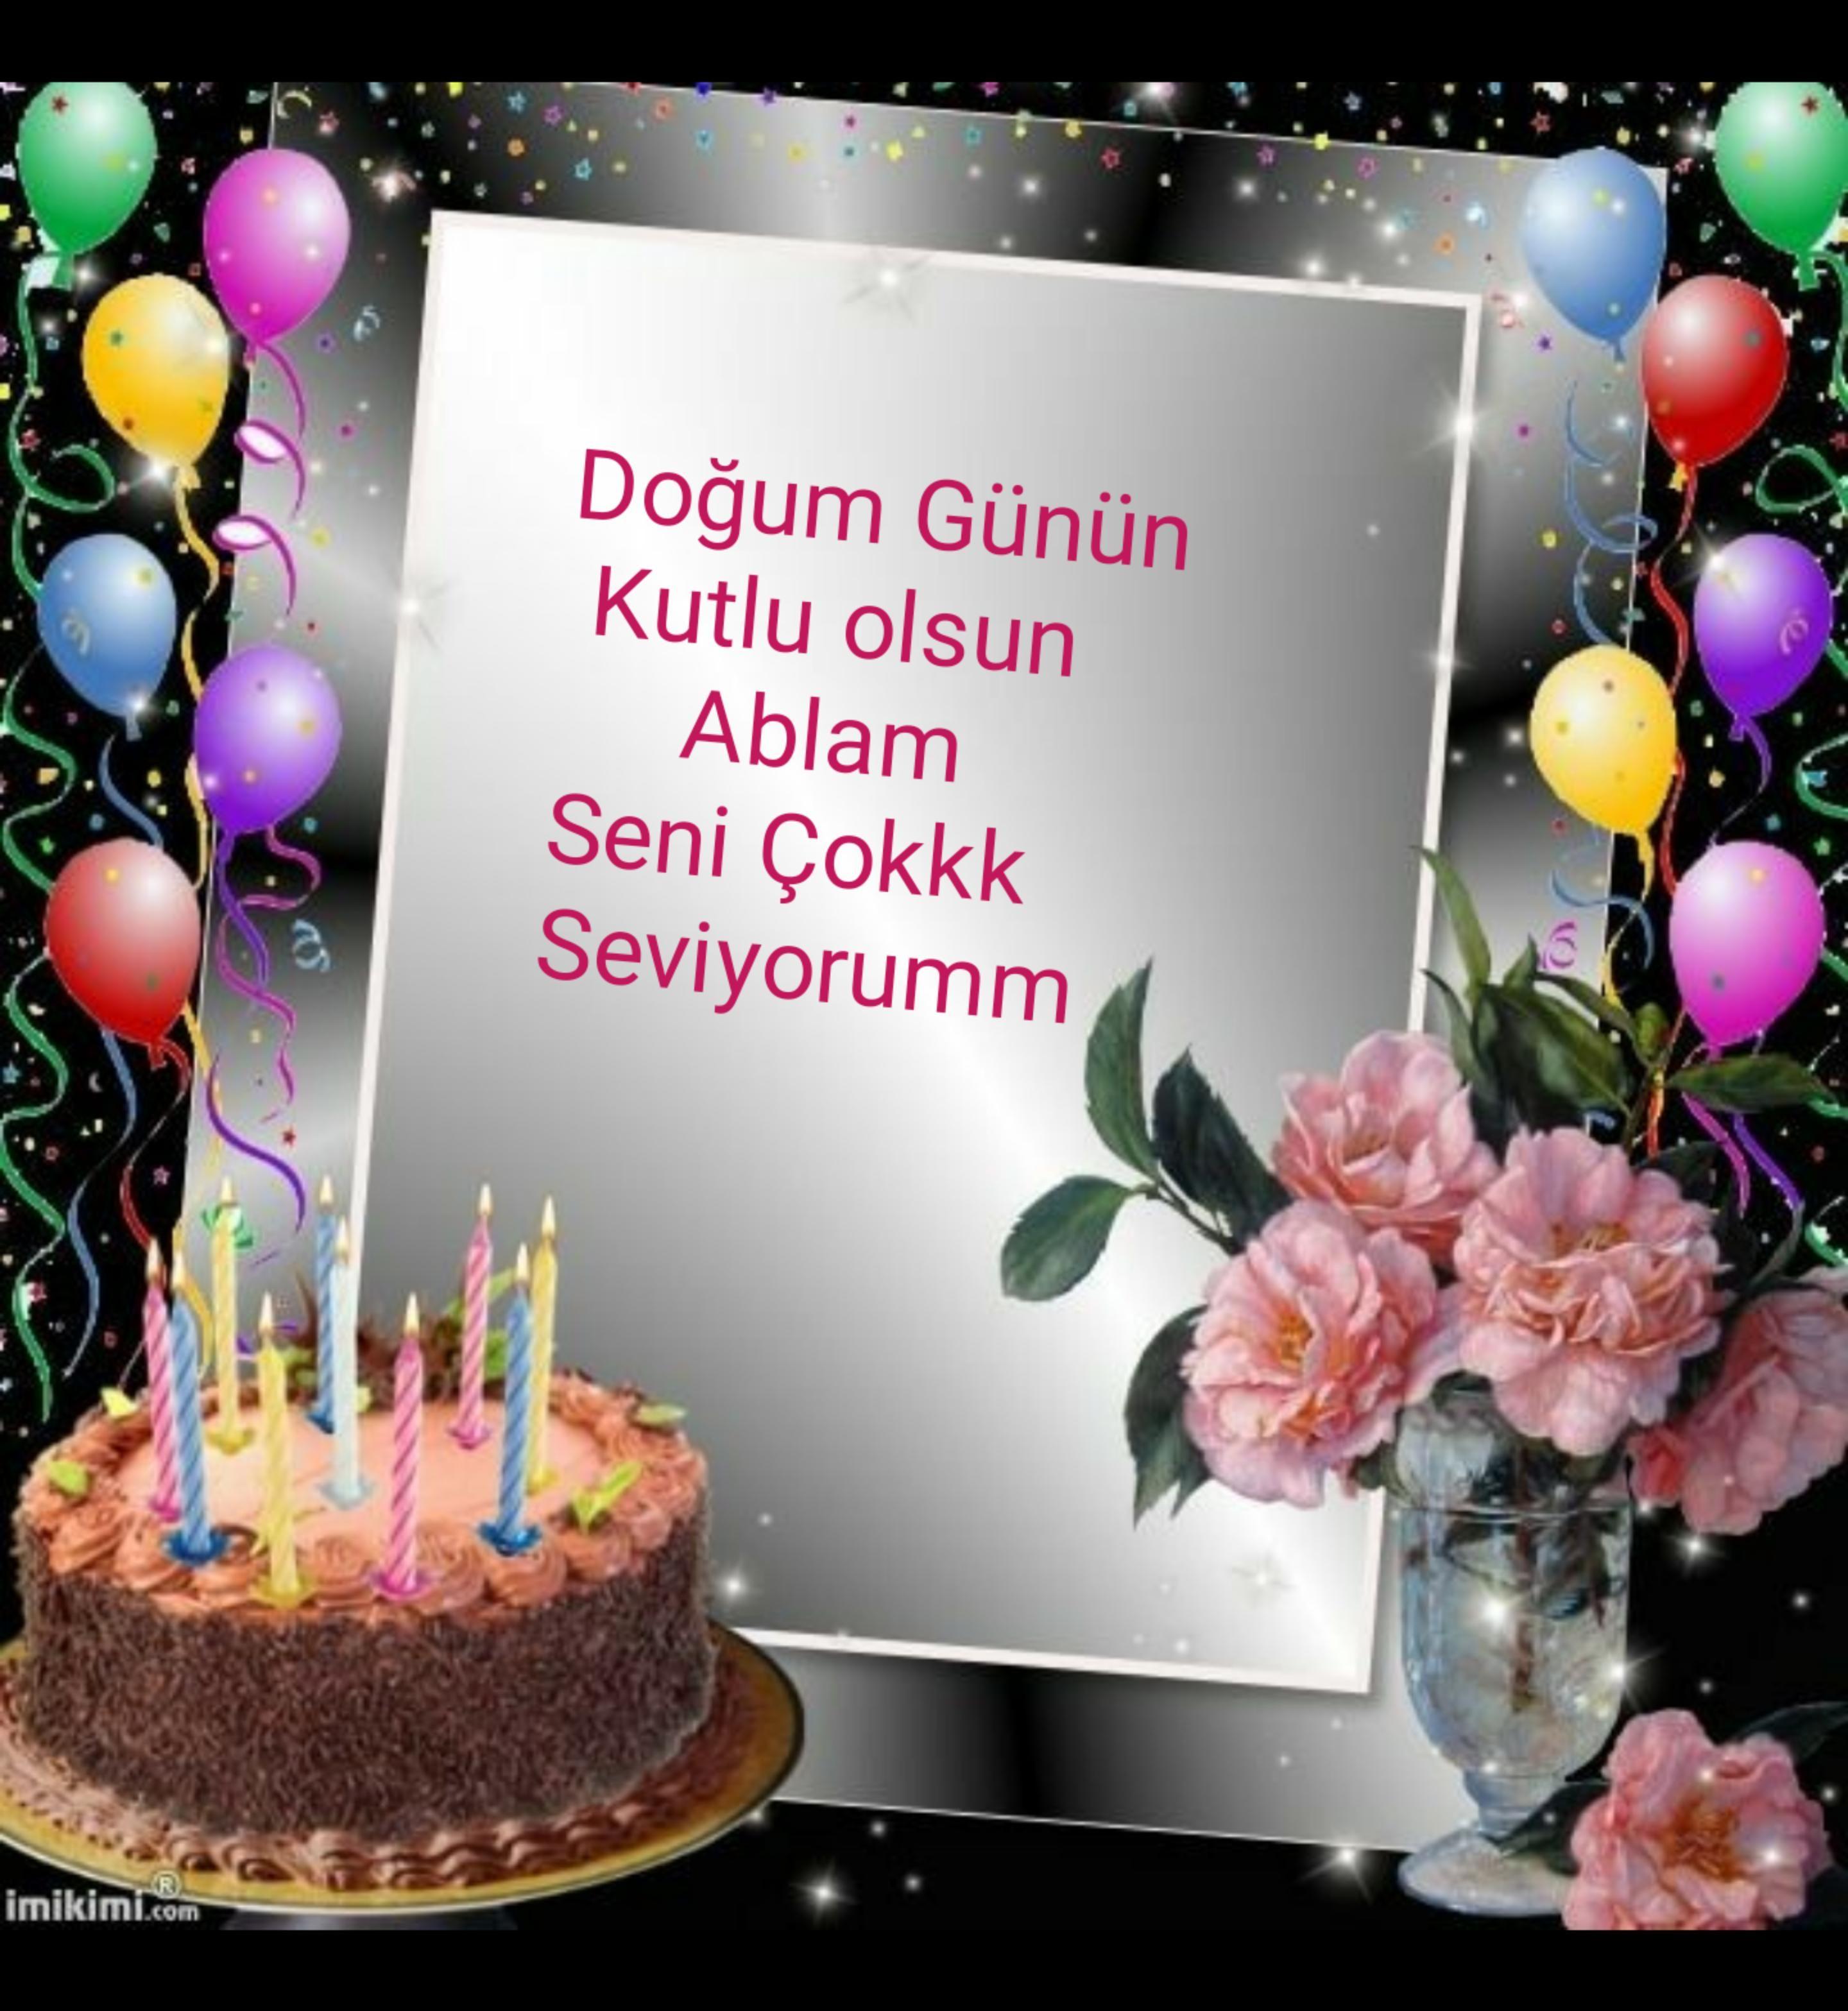 Ablaya Dogum Gunu Mesaji Guzel Sozler Happy Birthday Frame Bday Quotes Happy B Day